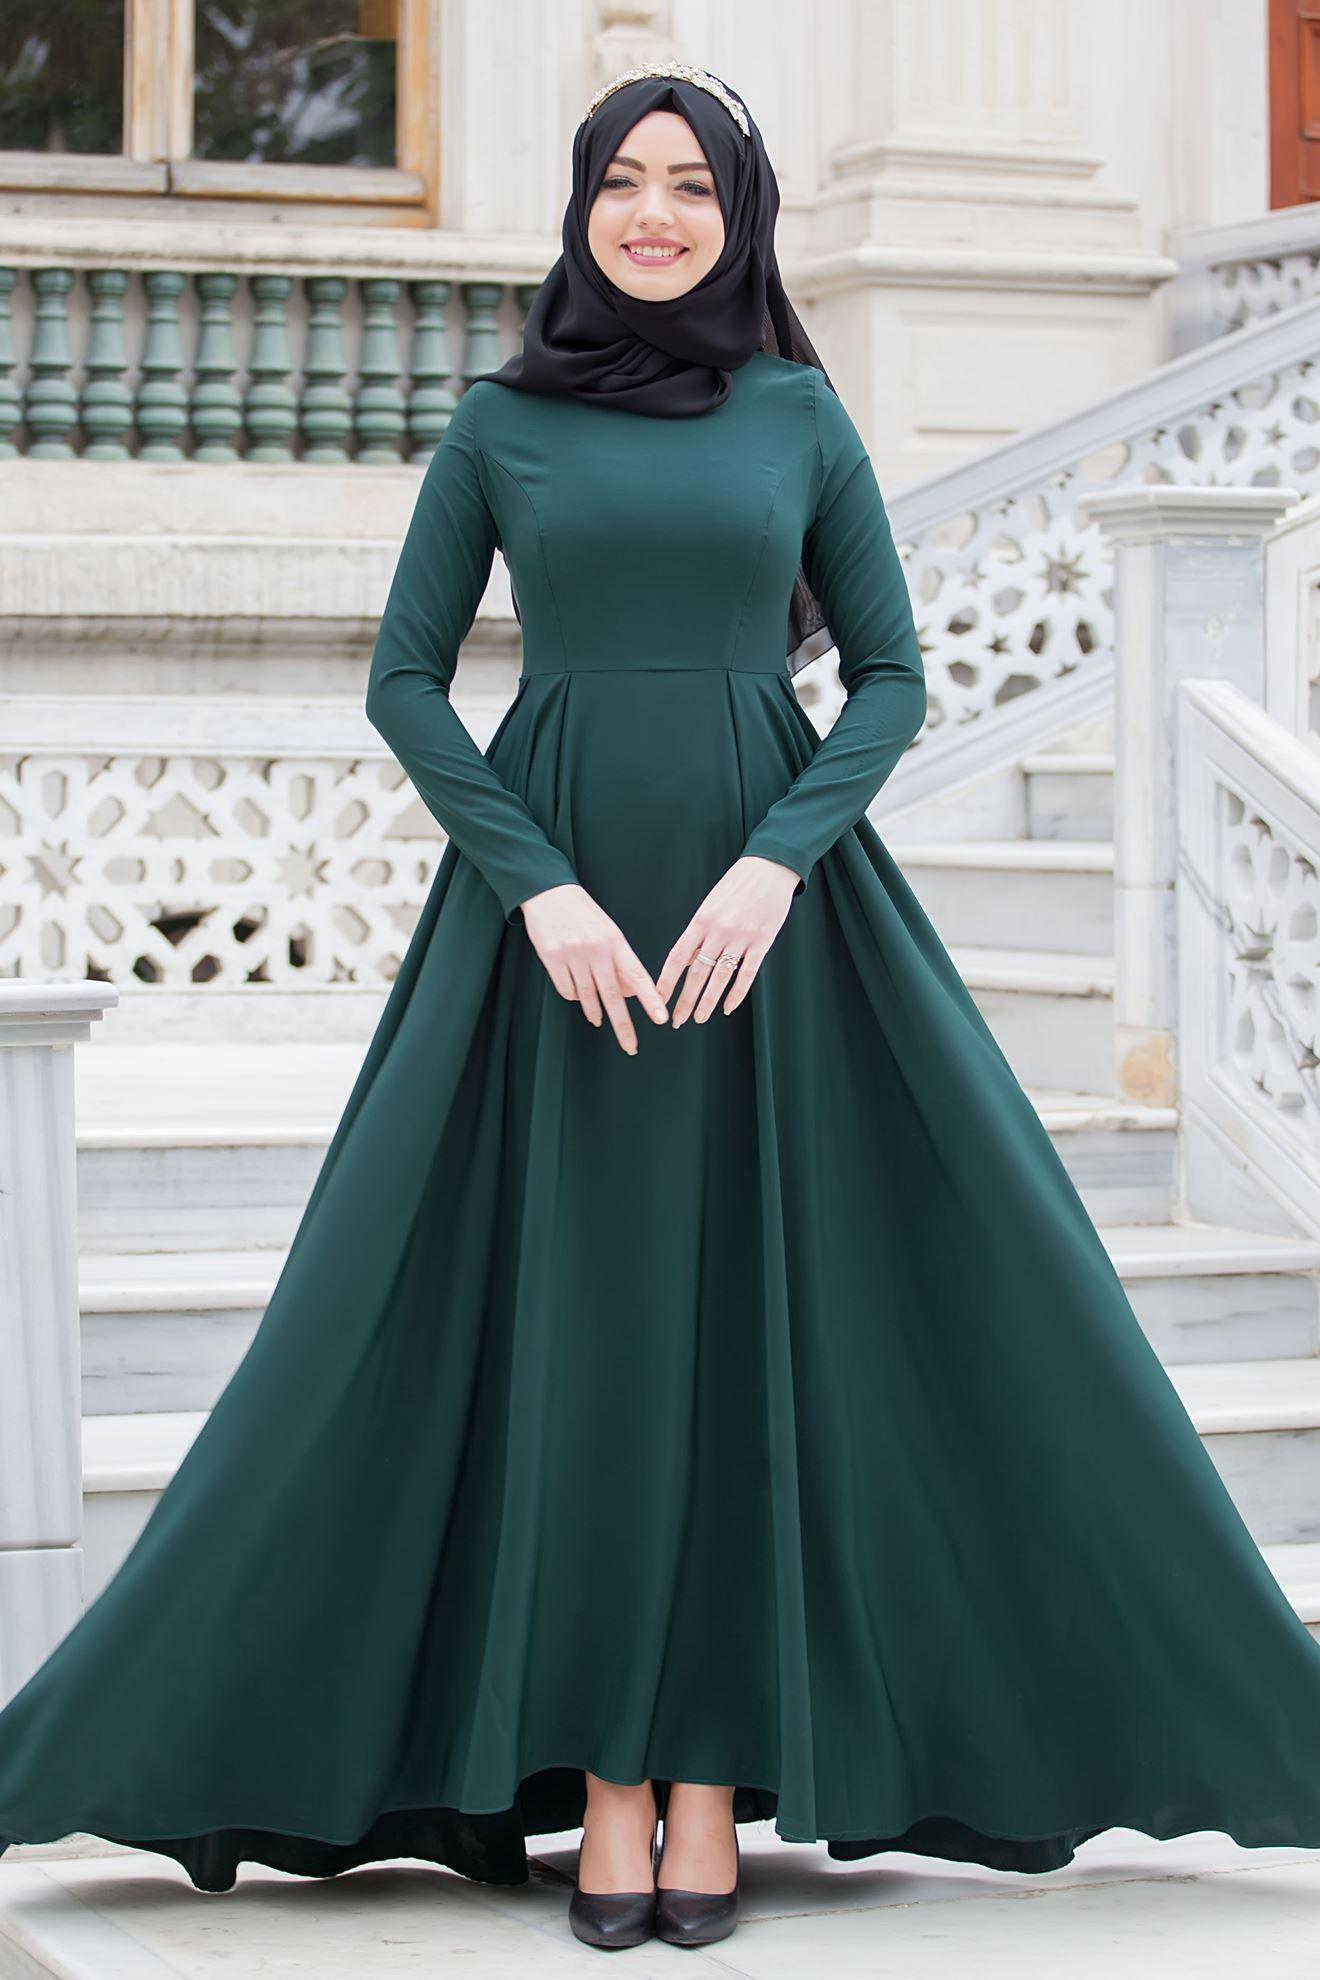 Sedanur Collection Zumrut Yesil Elbise Http Www Sedanur Com Sedanur Collection Zumrut Yesil Elbise 2 Elbise Modelleri Elbise Giyim